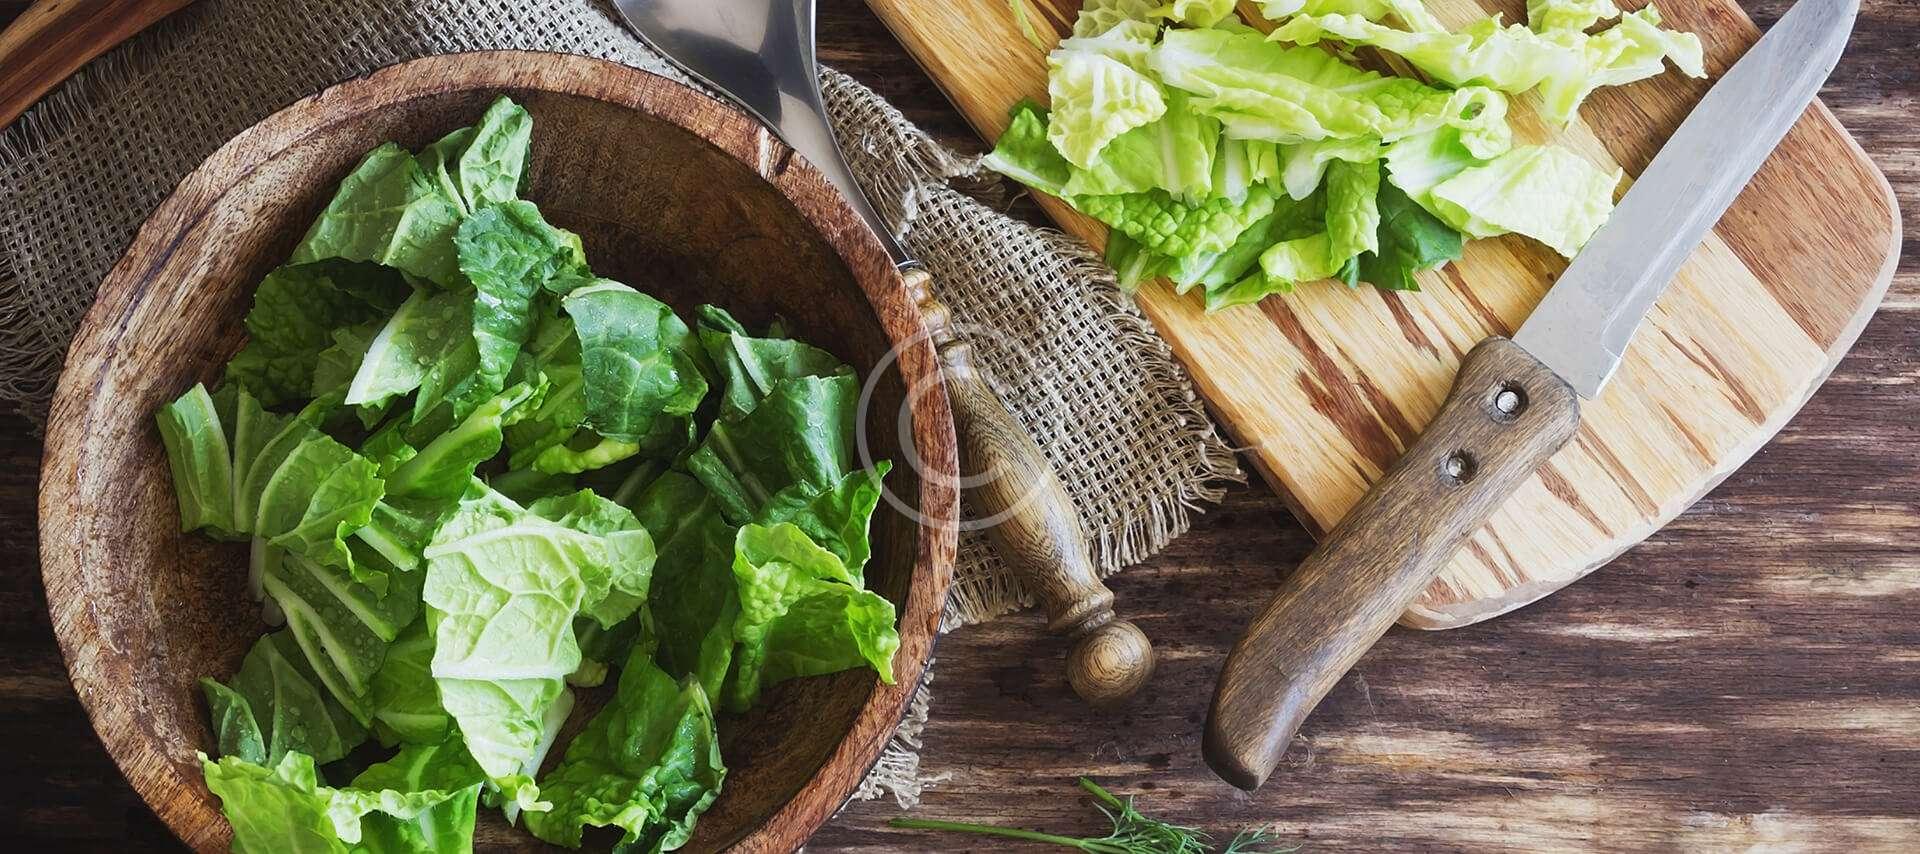 Salade verte vinaigrette au miel